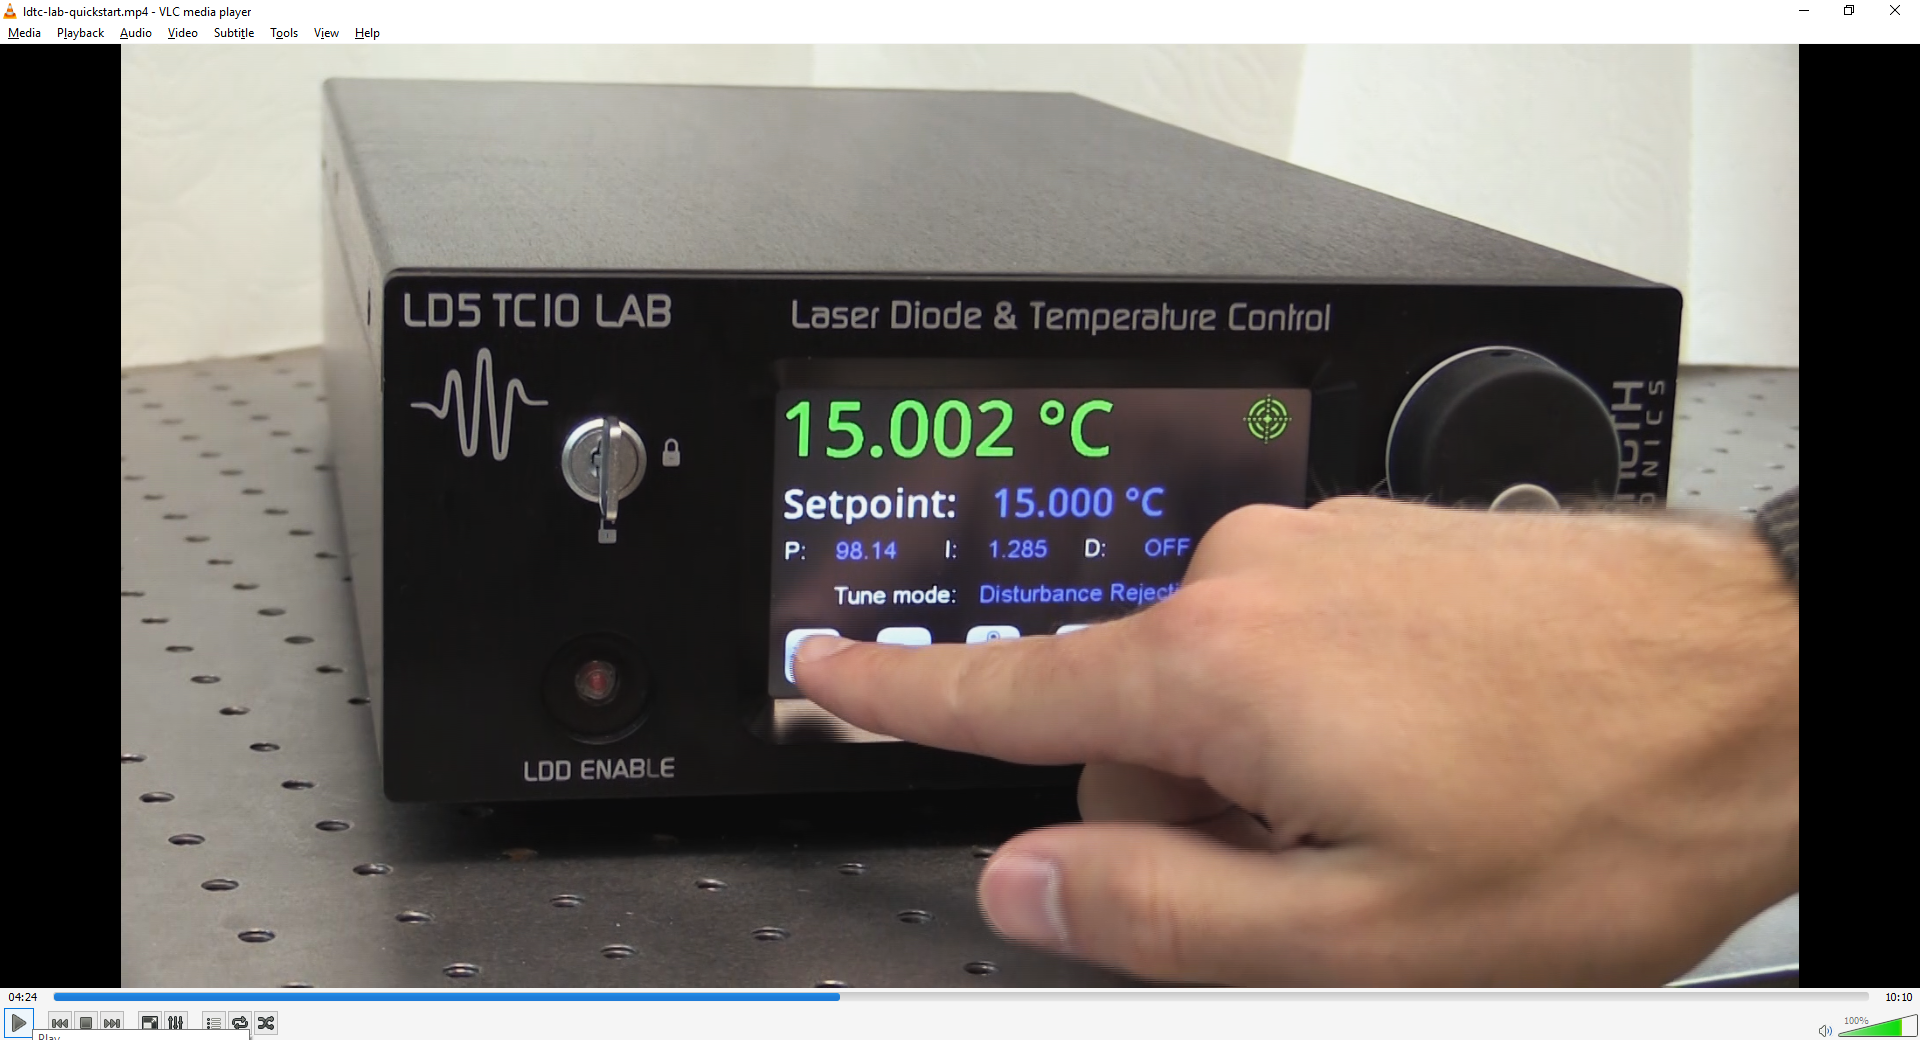 VIDEO: LDTC LAB Series Instrument Quick Start